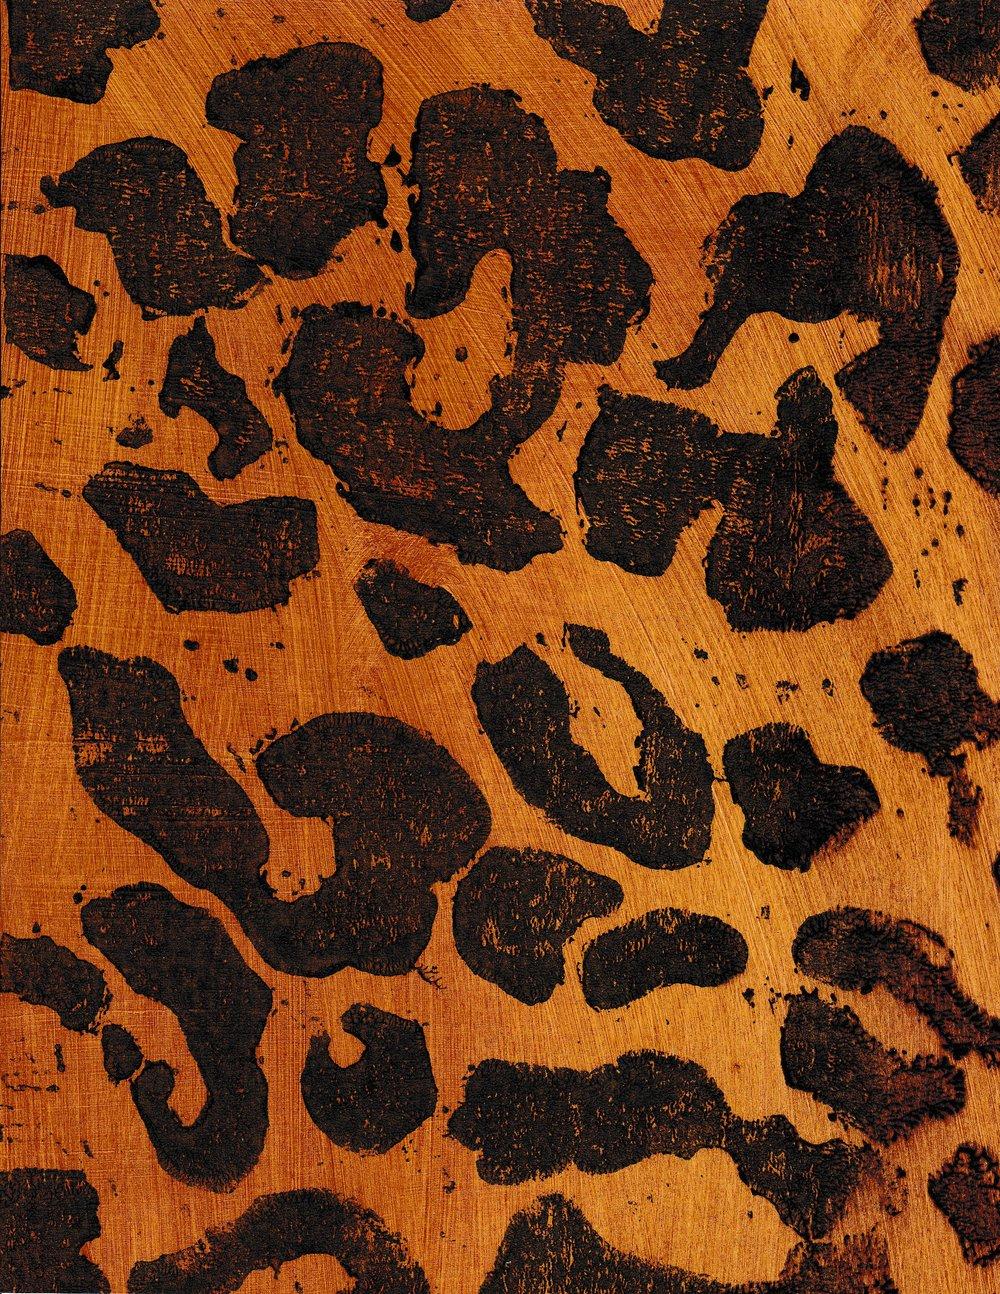 P101: Leopard - Serengeti